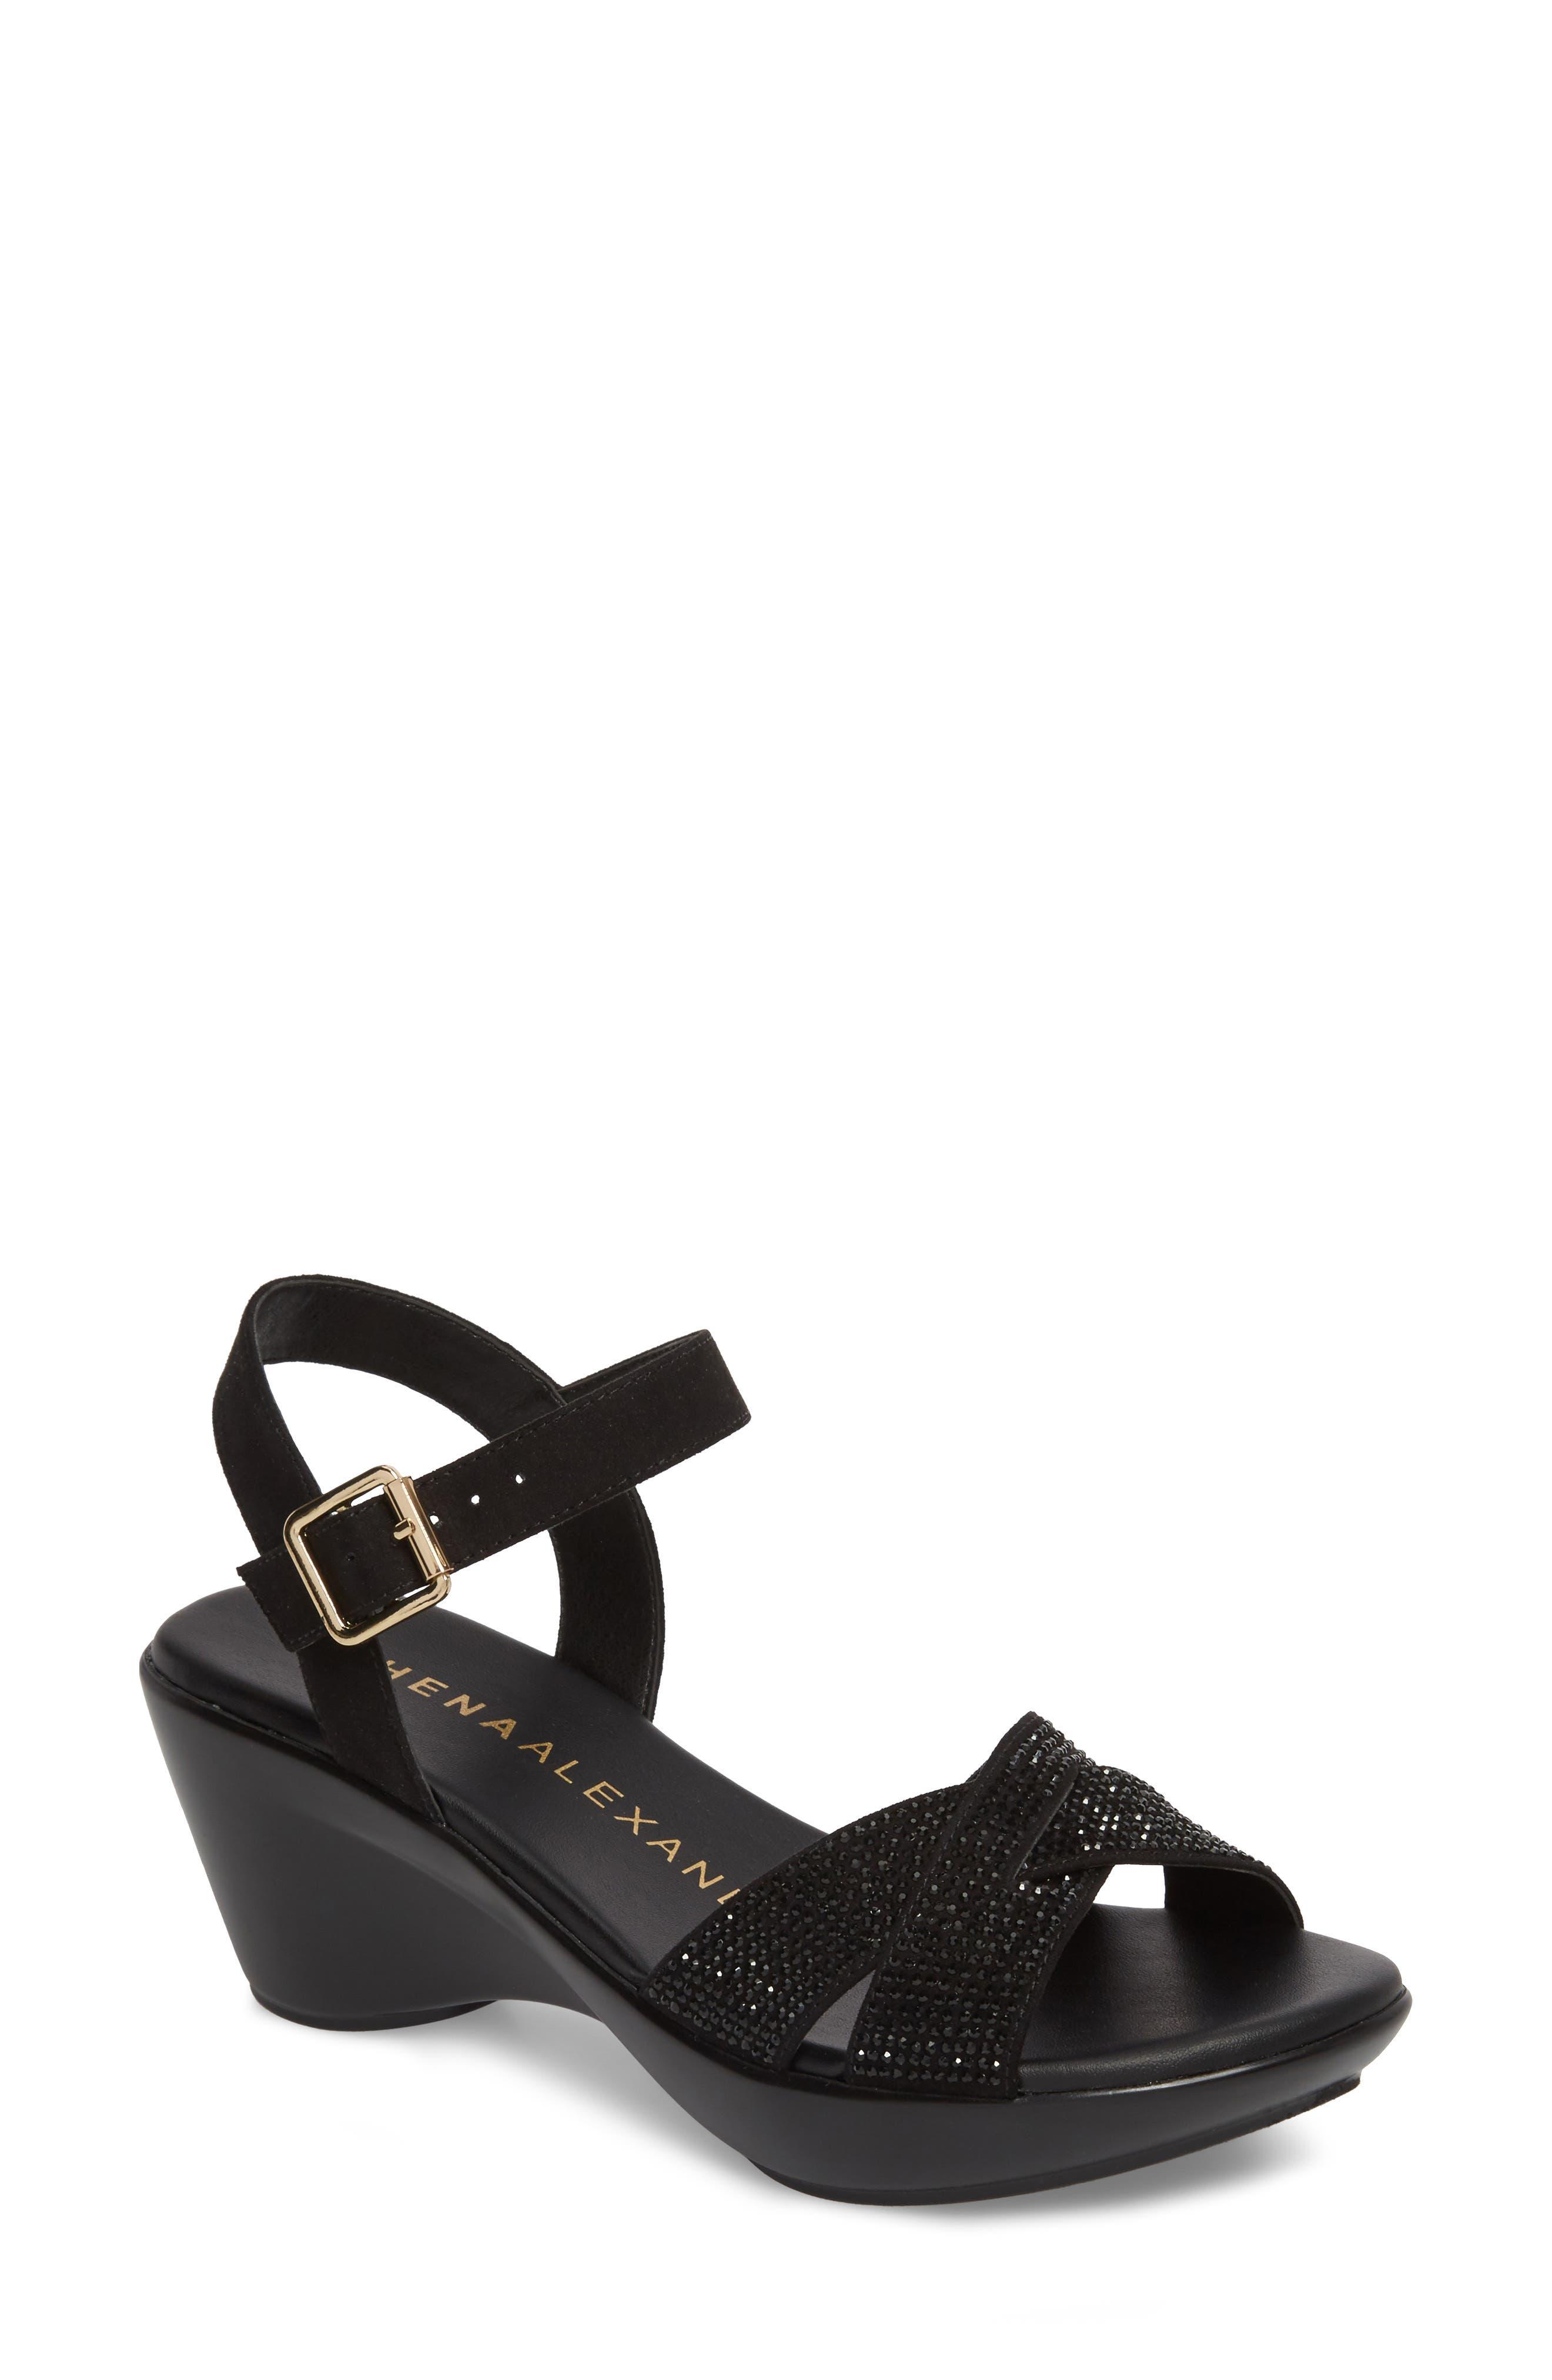 Florence Wedge Sandal,                             Main thumbnail 1, color,                             Black Faux Suede